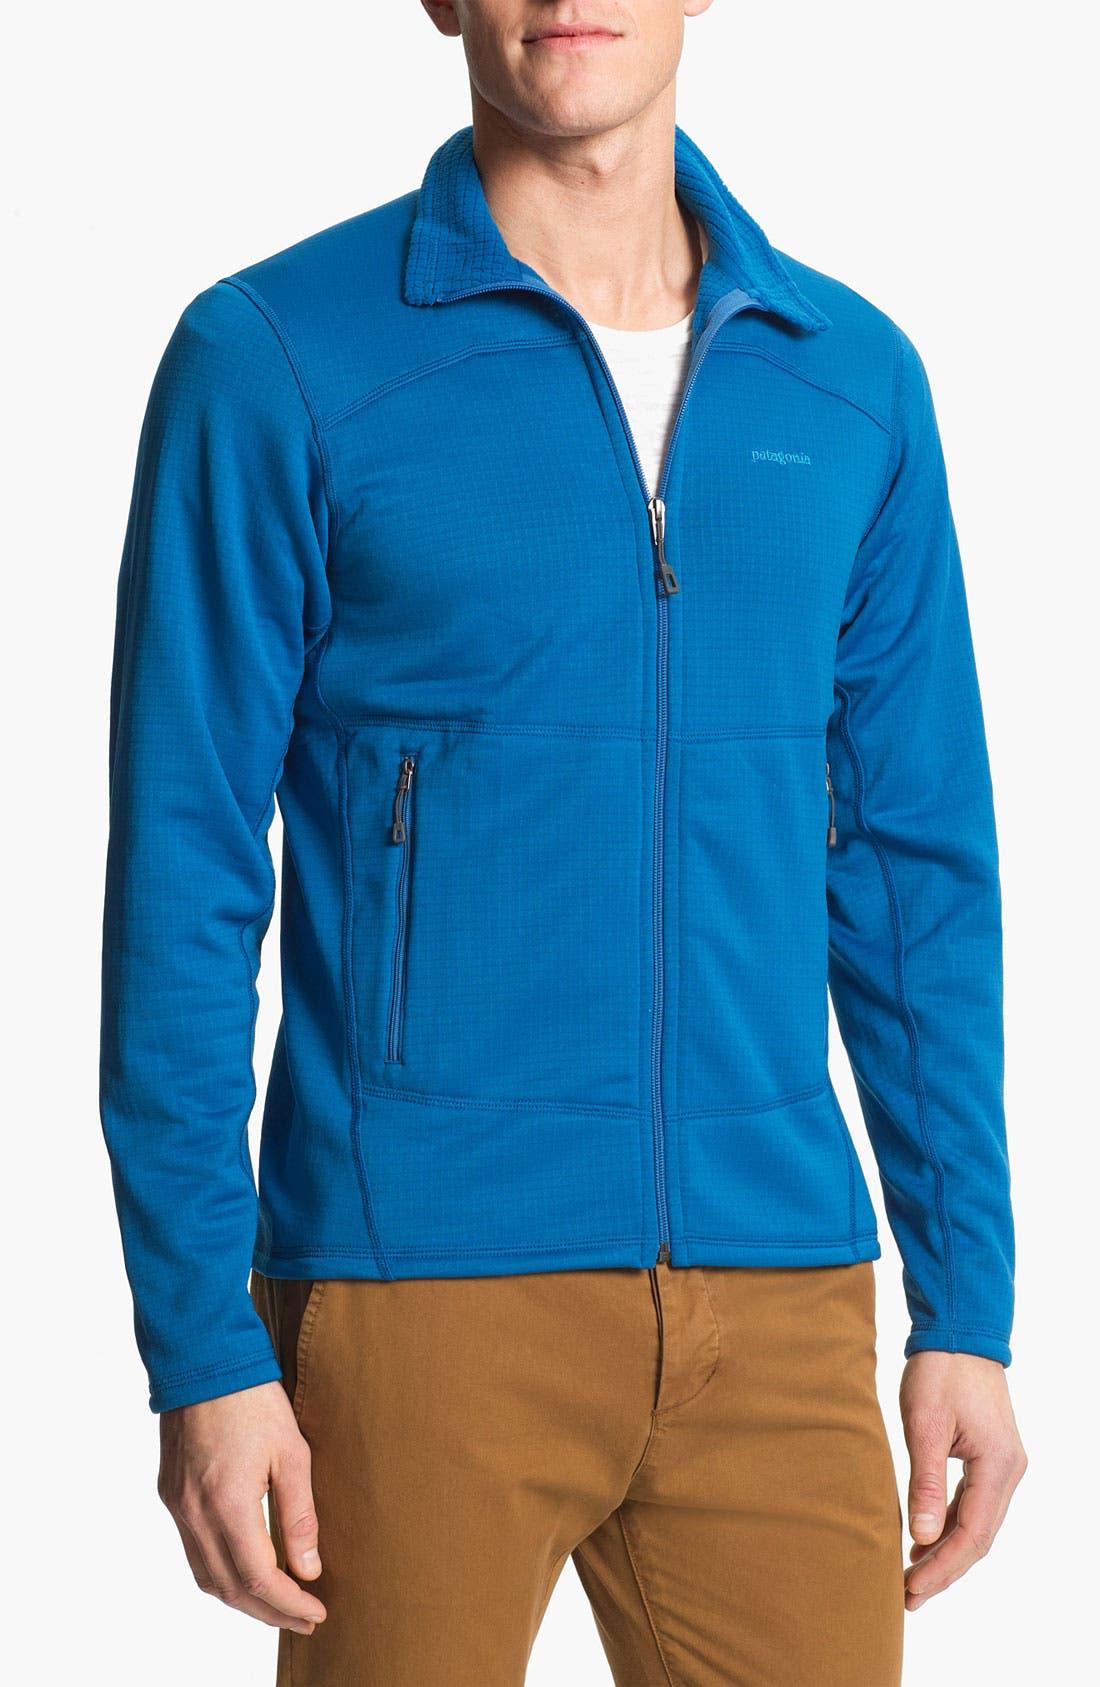 Main Image - Patagonia 'MSR1' Zip Fleece Jacket